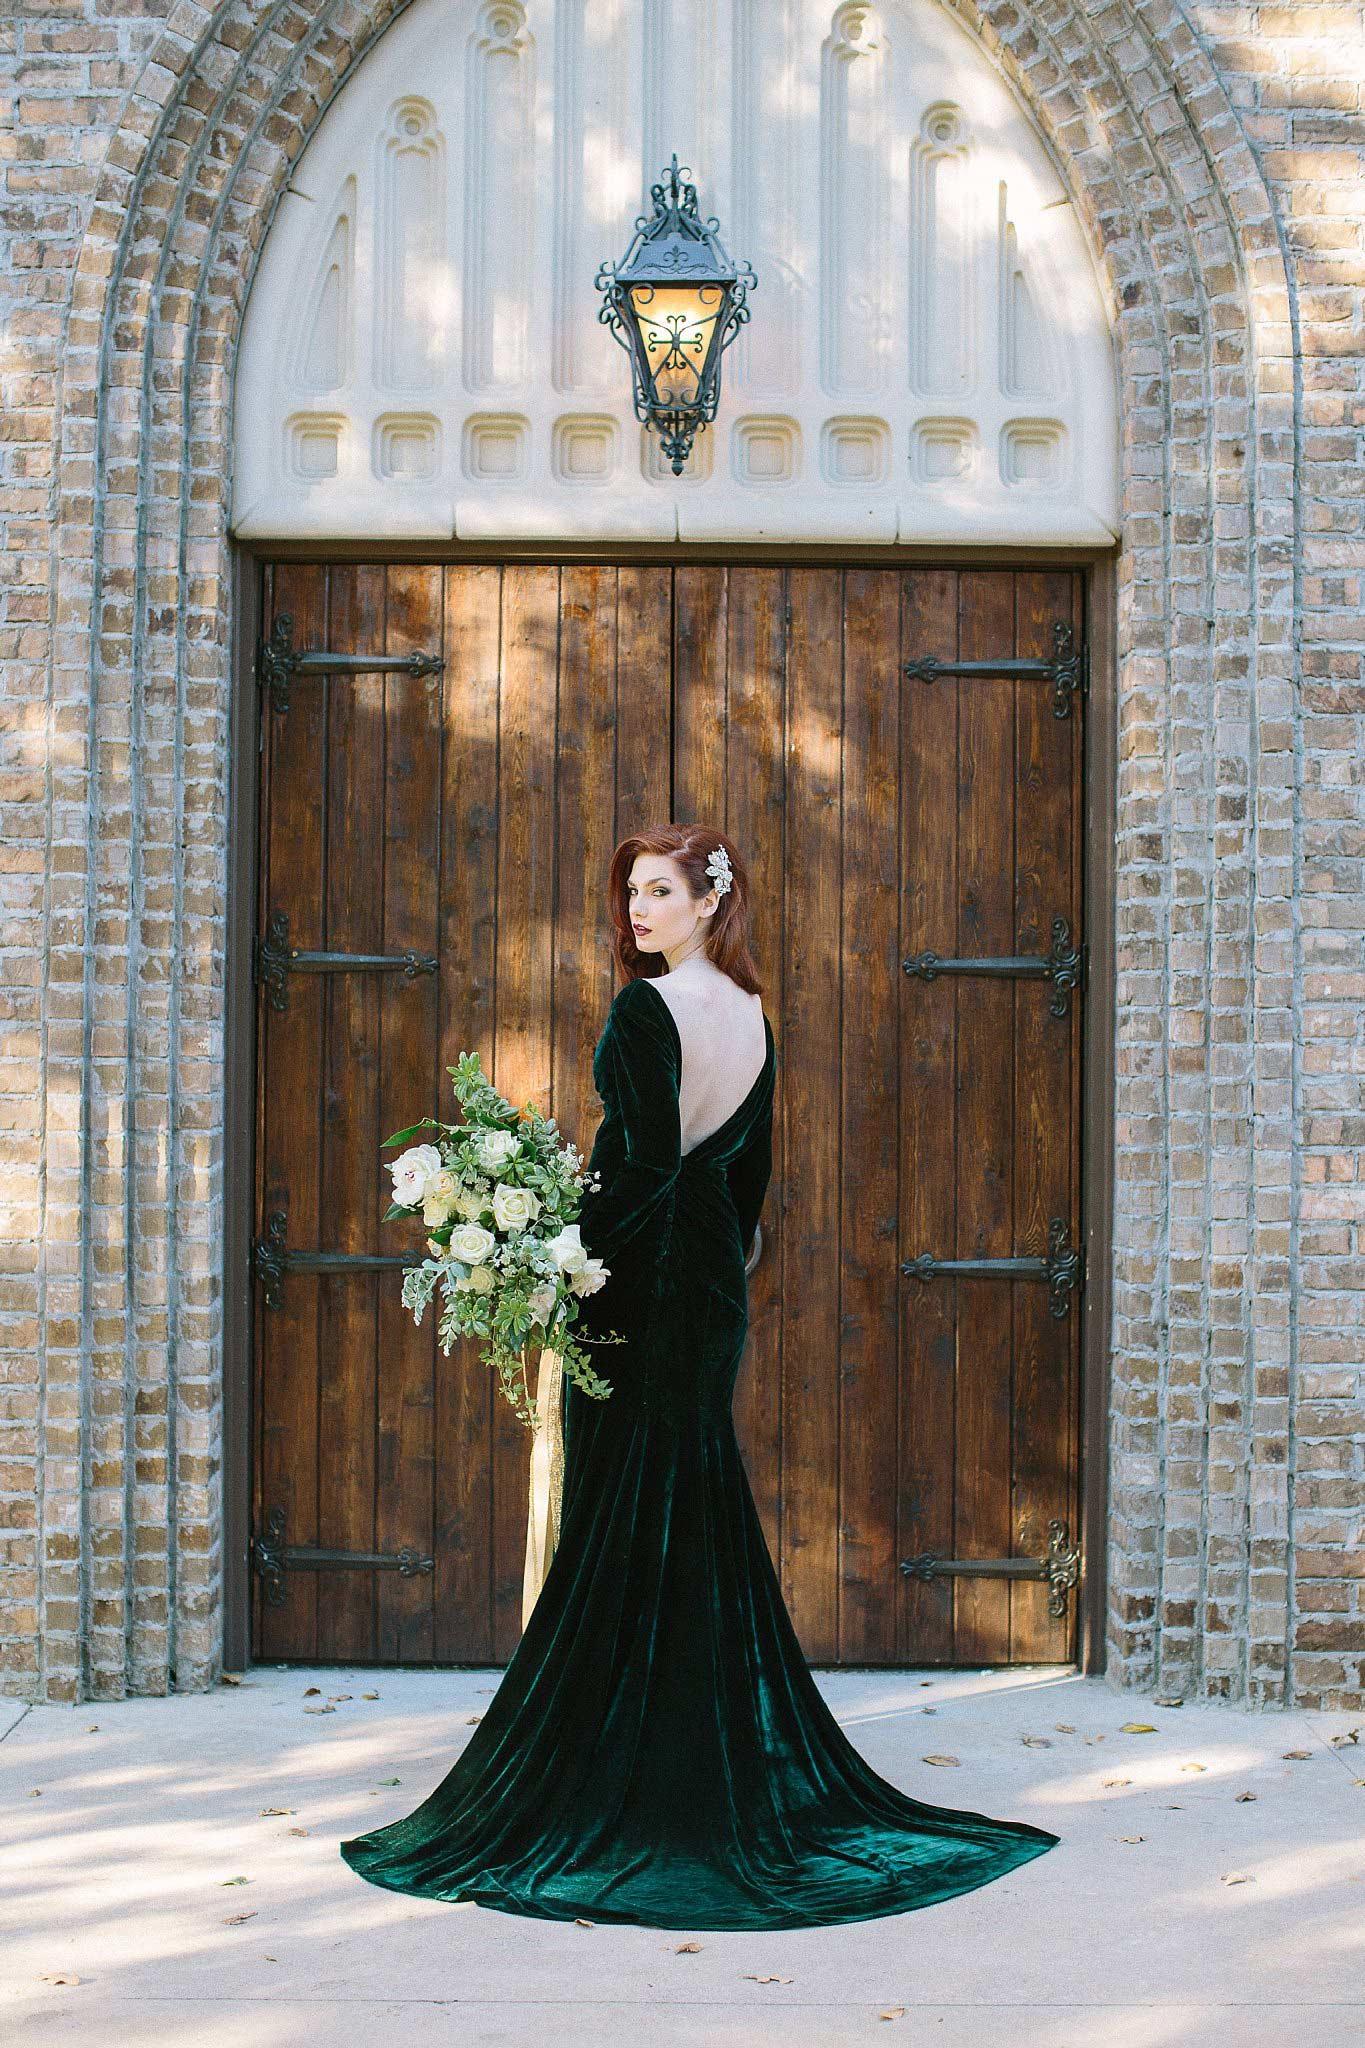 aristide mansfield wooden door entry with bridesmaid in green velvet dress